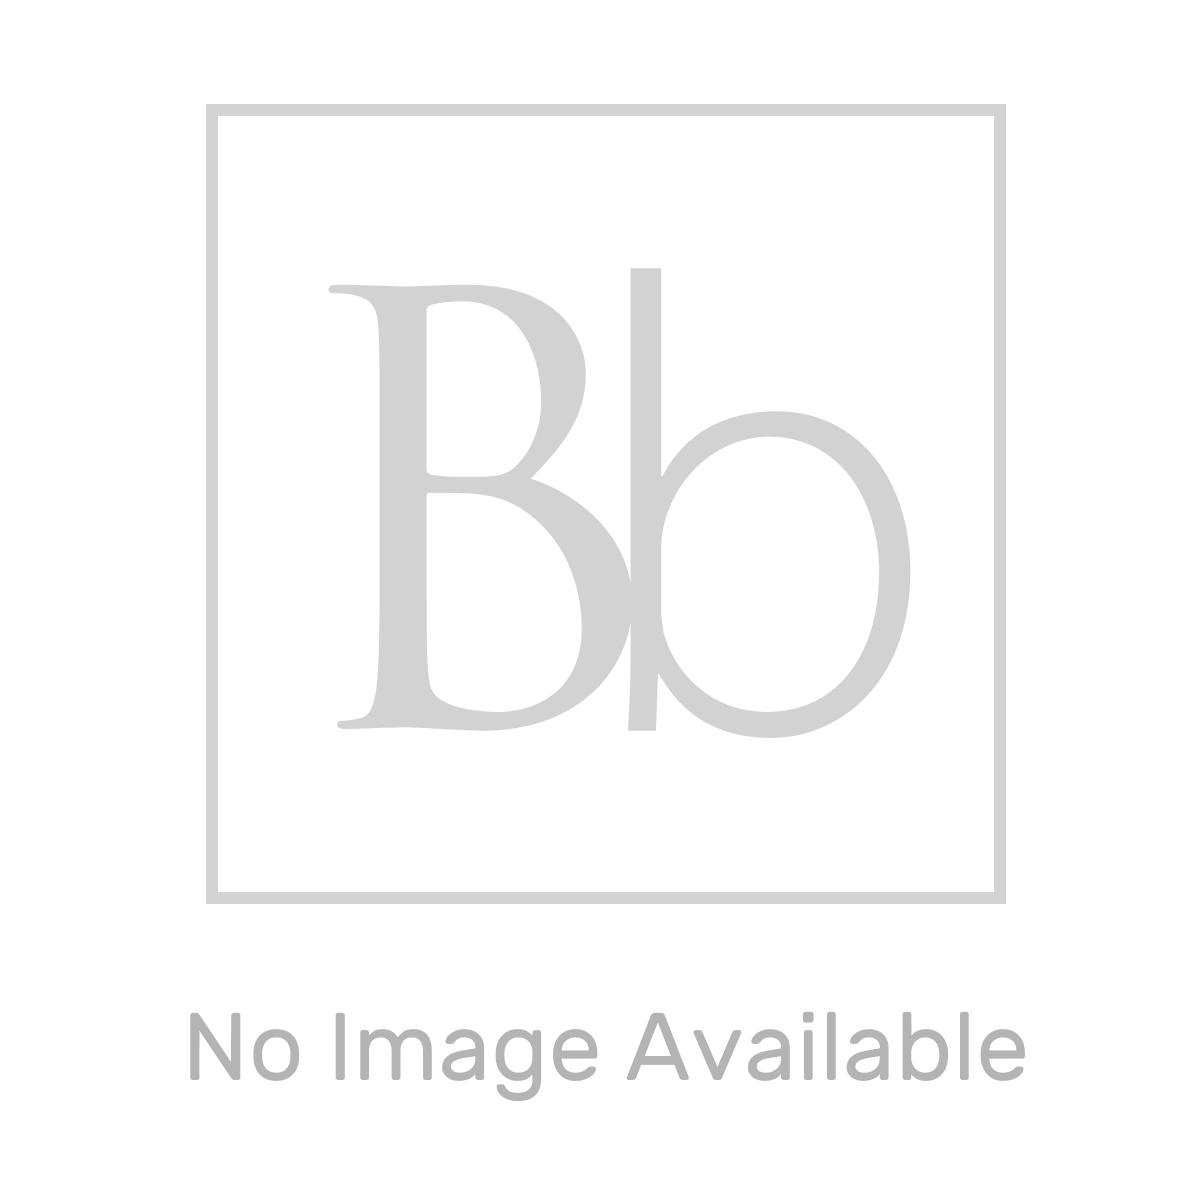 Cassellie Wharfe Flush To Wall Toilet with Wrapover Seat